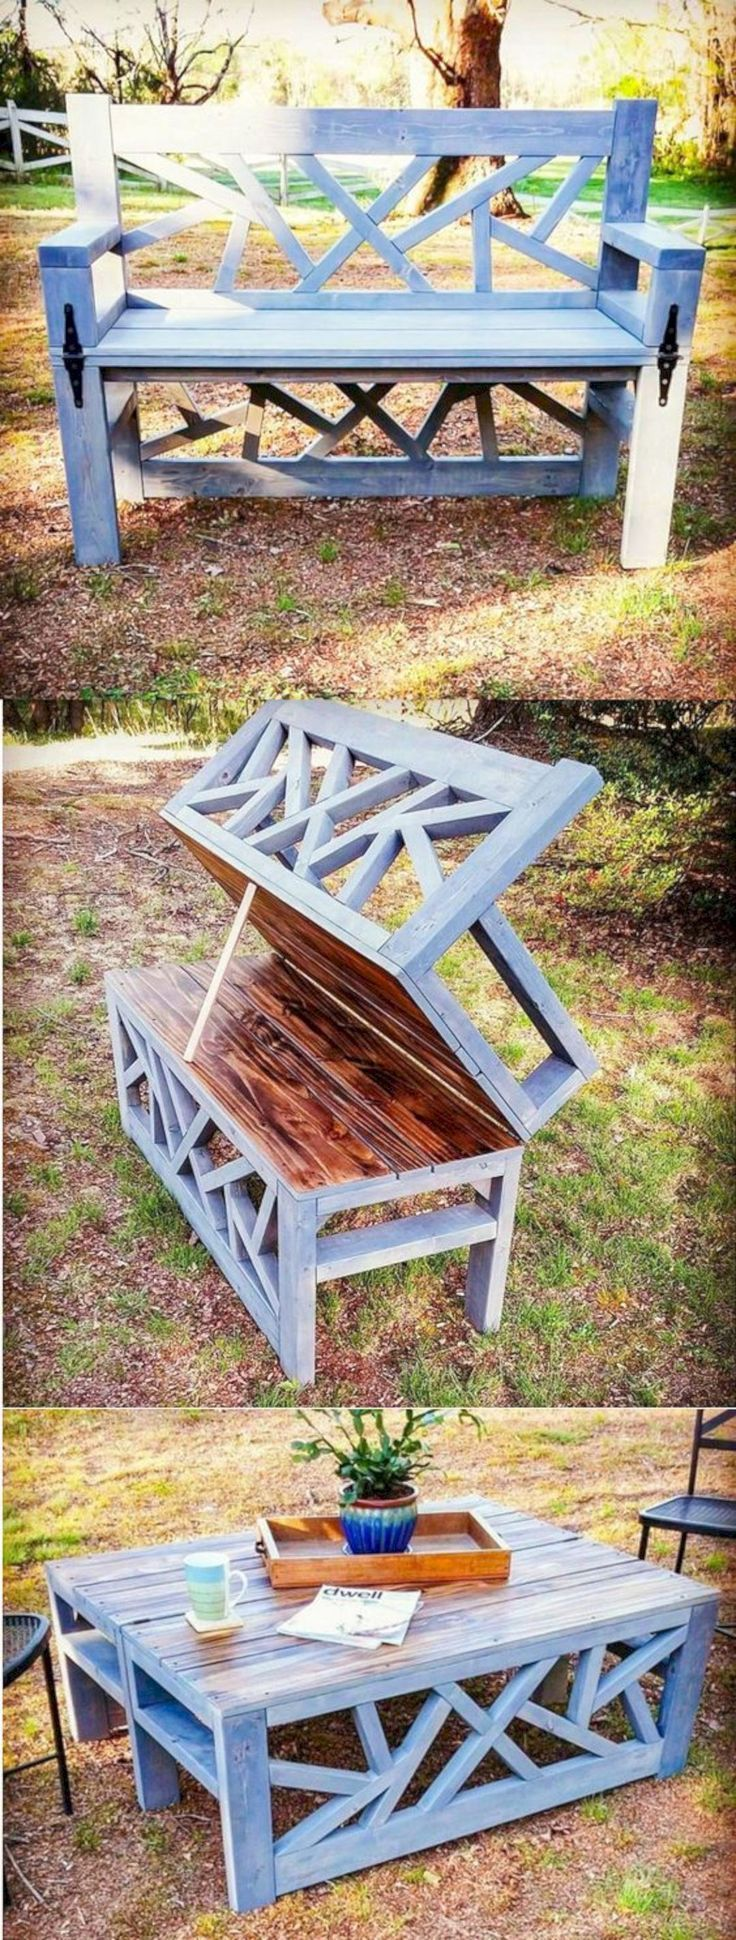 18 #Super #Cool #and #Unique # Furniture #Ideas    – Möbel